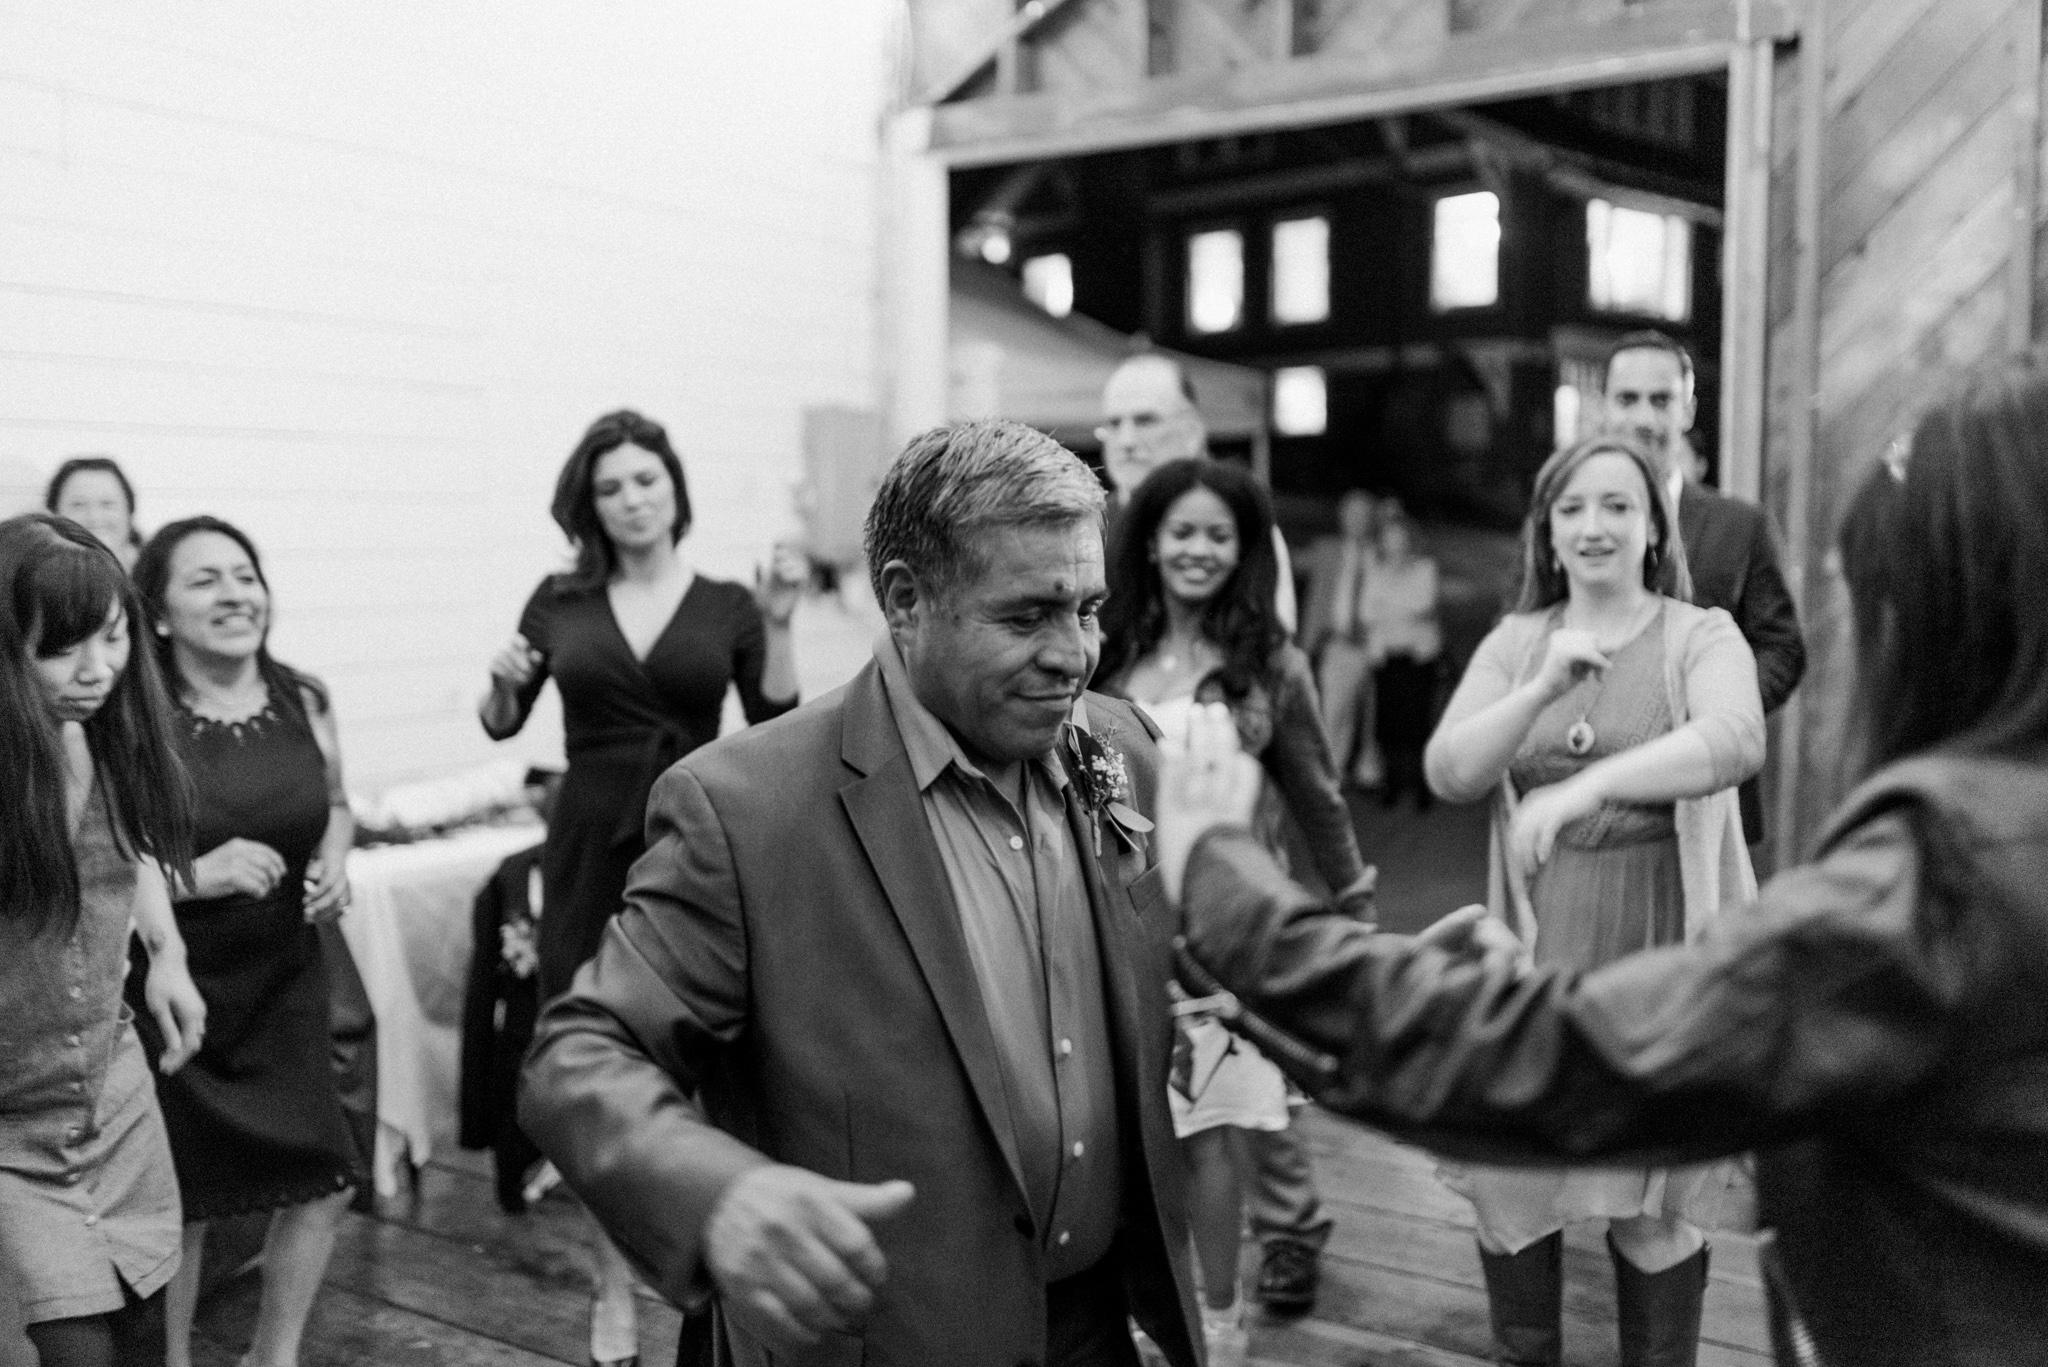 Bellingham wedding Woodstock Farms Vishal Goklani Seattle Wedding Photographer037.JPG